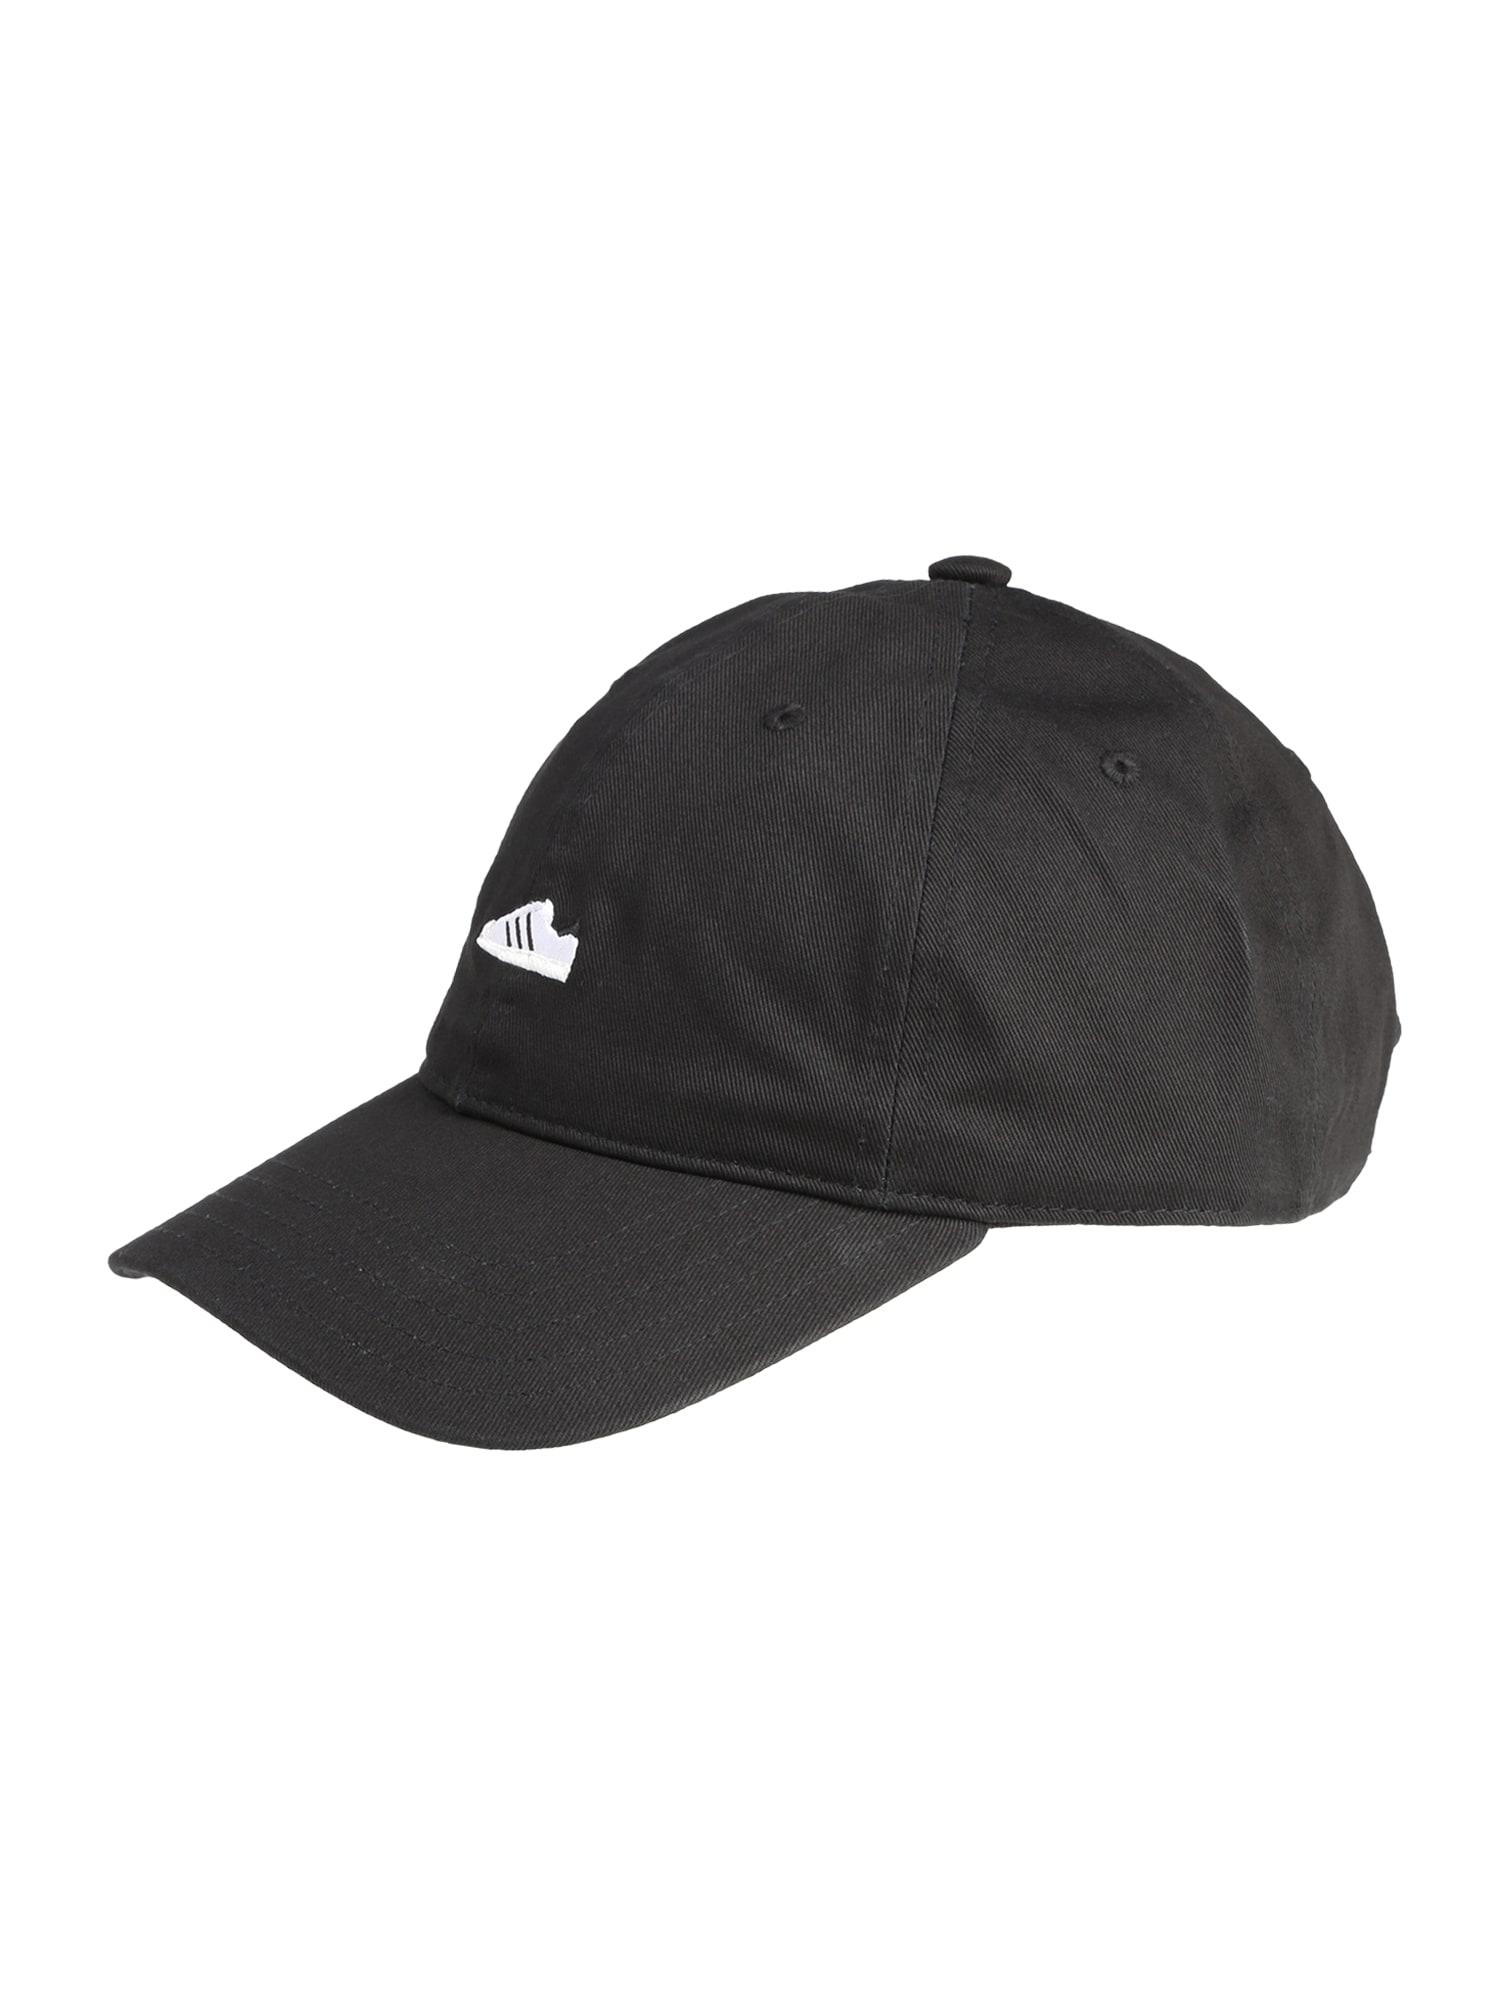 Kšiltovka černá ADIDAS ORIGINALS